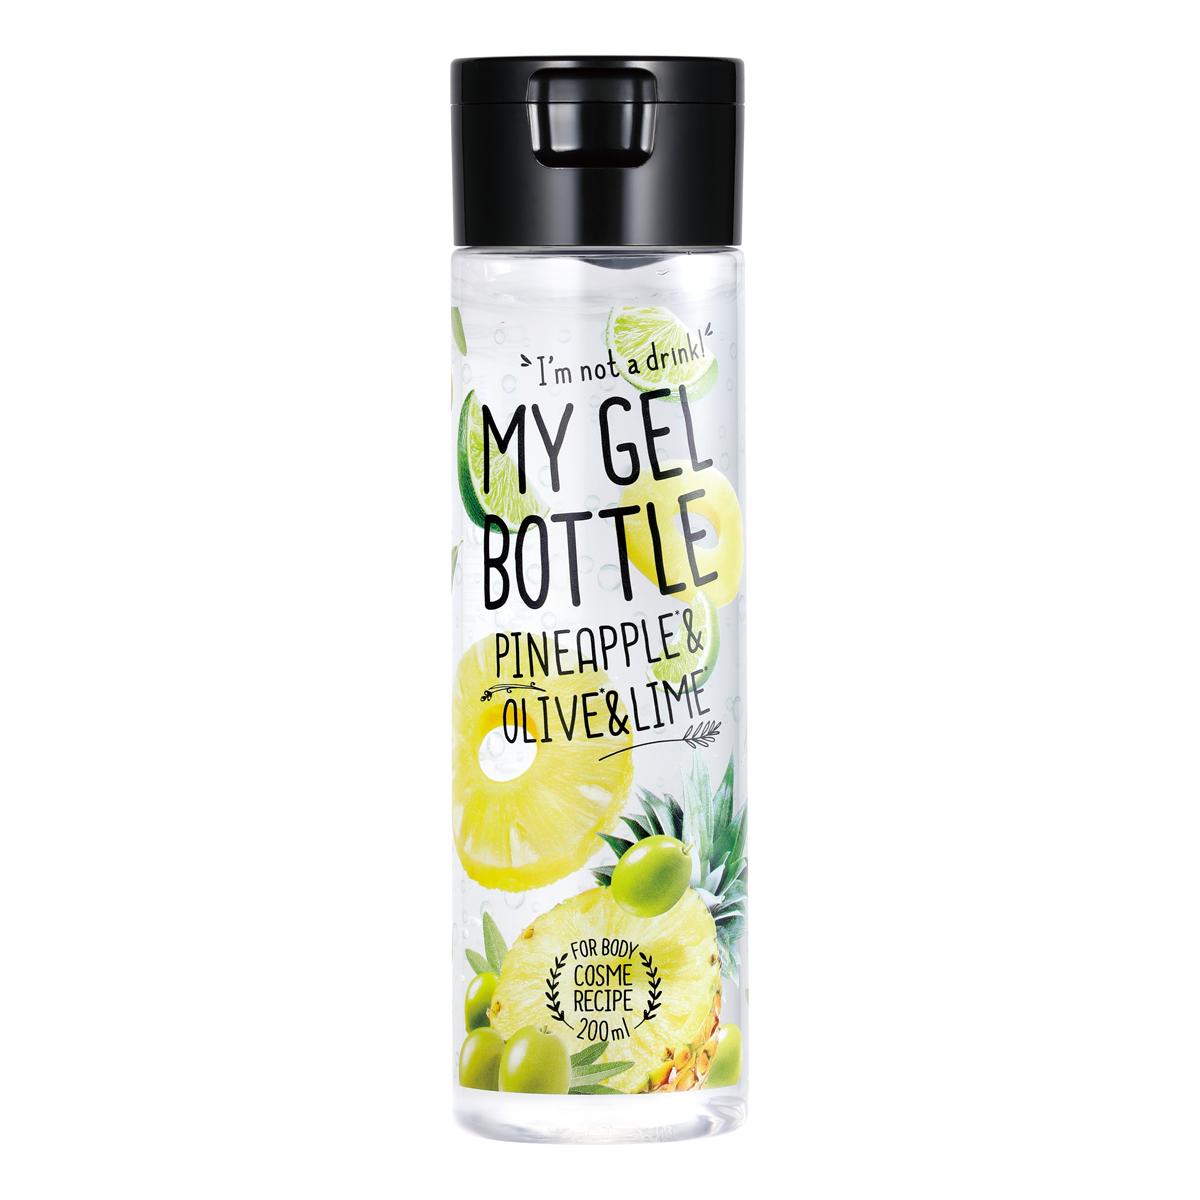 MY GEL BOTTLE[マイ・ジェル・ボトル]【香り:パイナップル】200ml